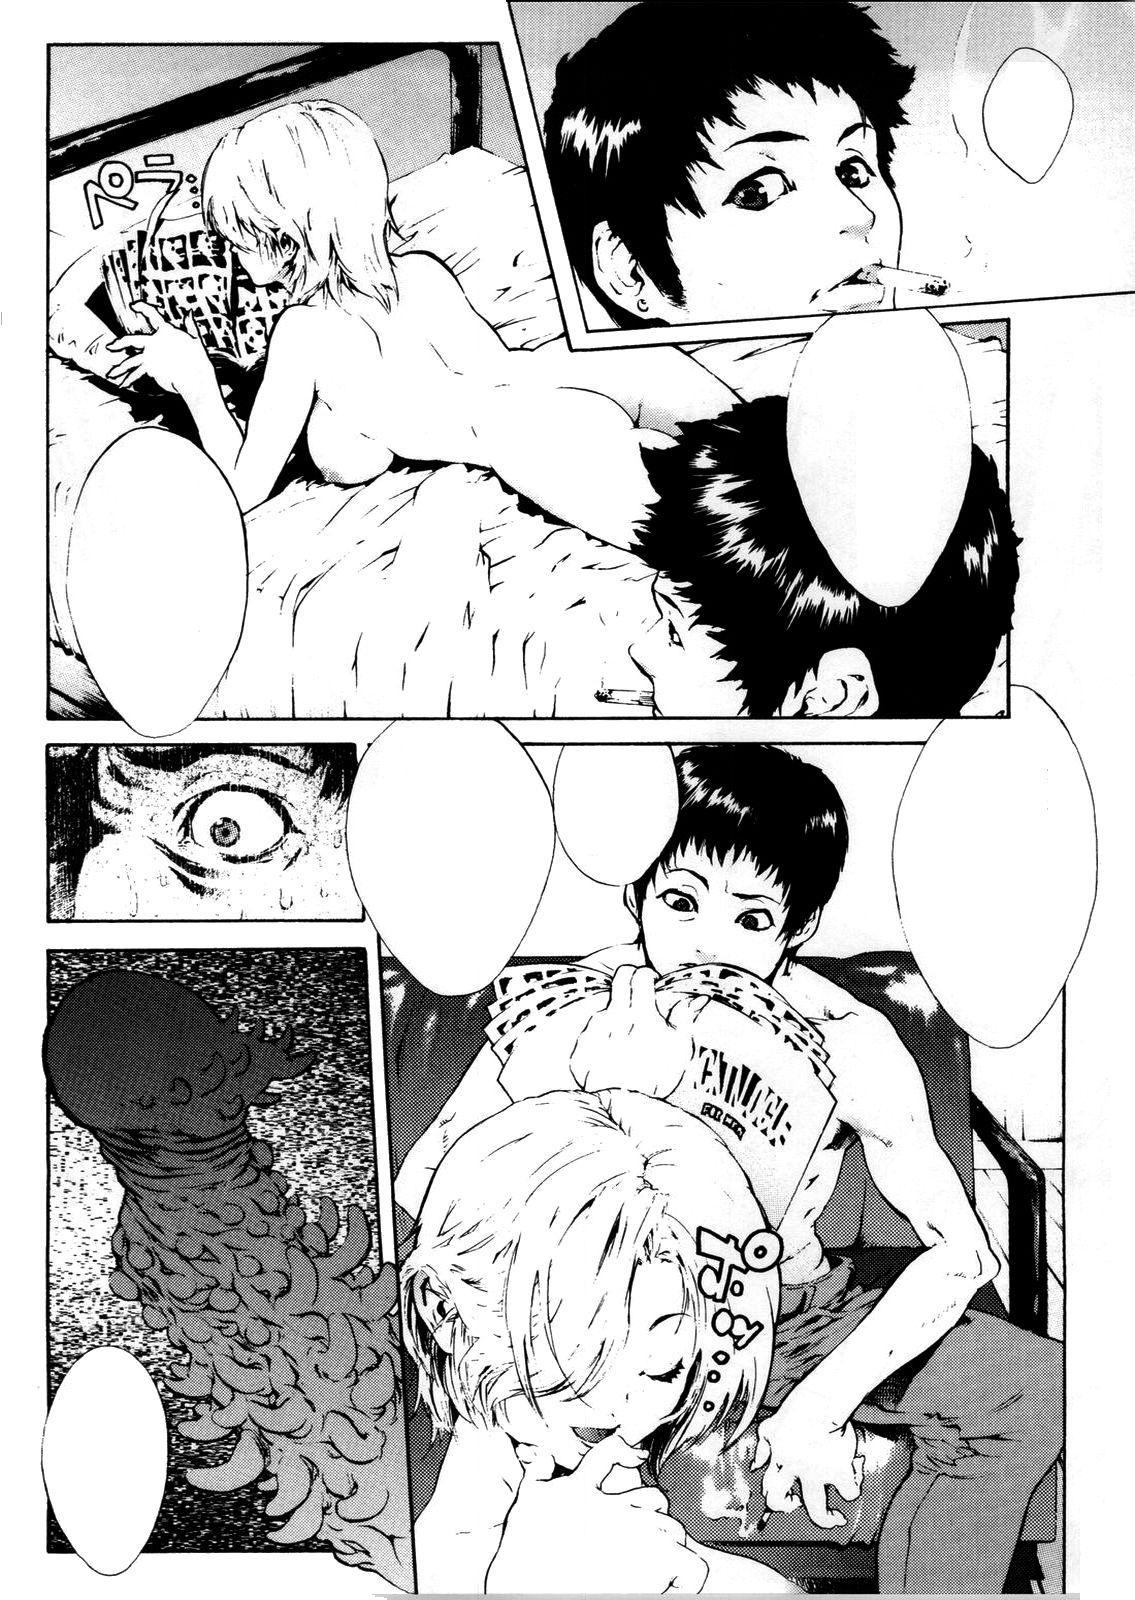 [NEWS (Akow Kazumi, COMA, Yamagata Sei)] ERO-TECH SIDE-A [Textless] 12